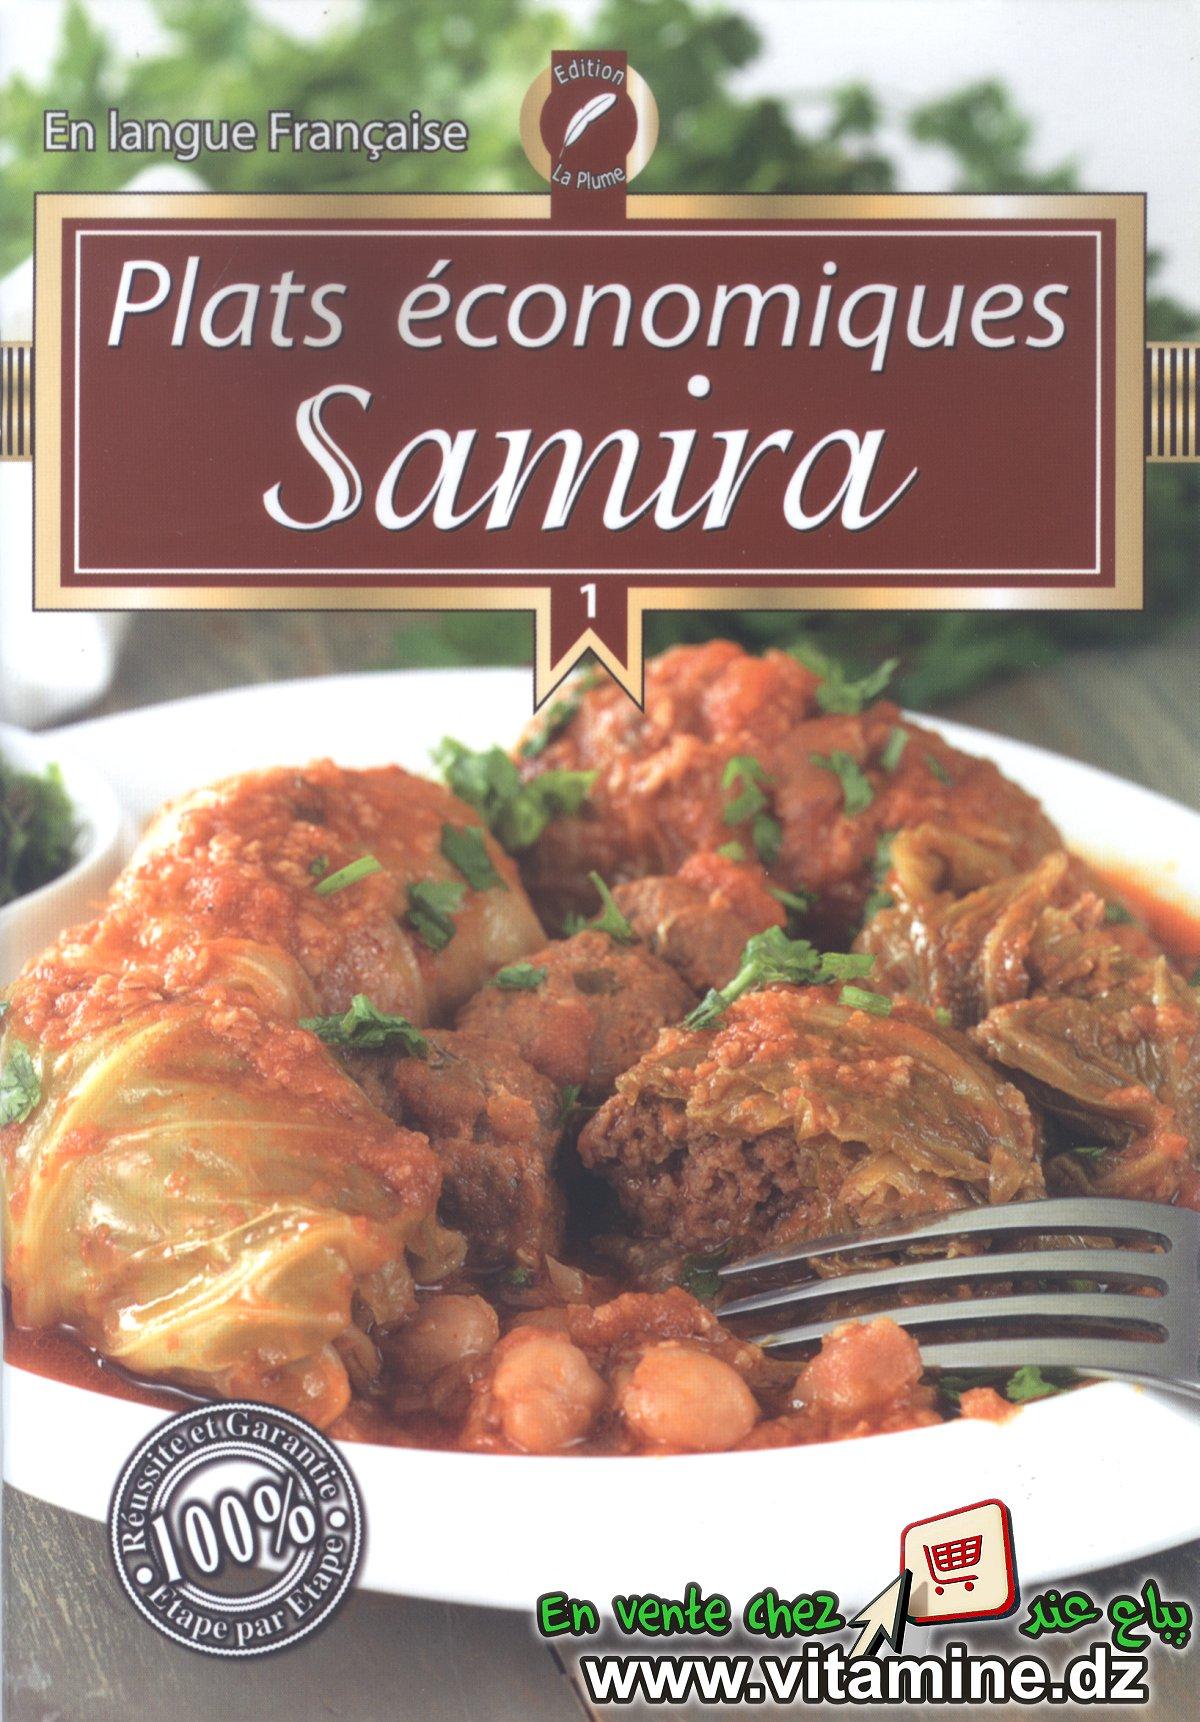 Samira - Plats économiques